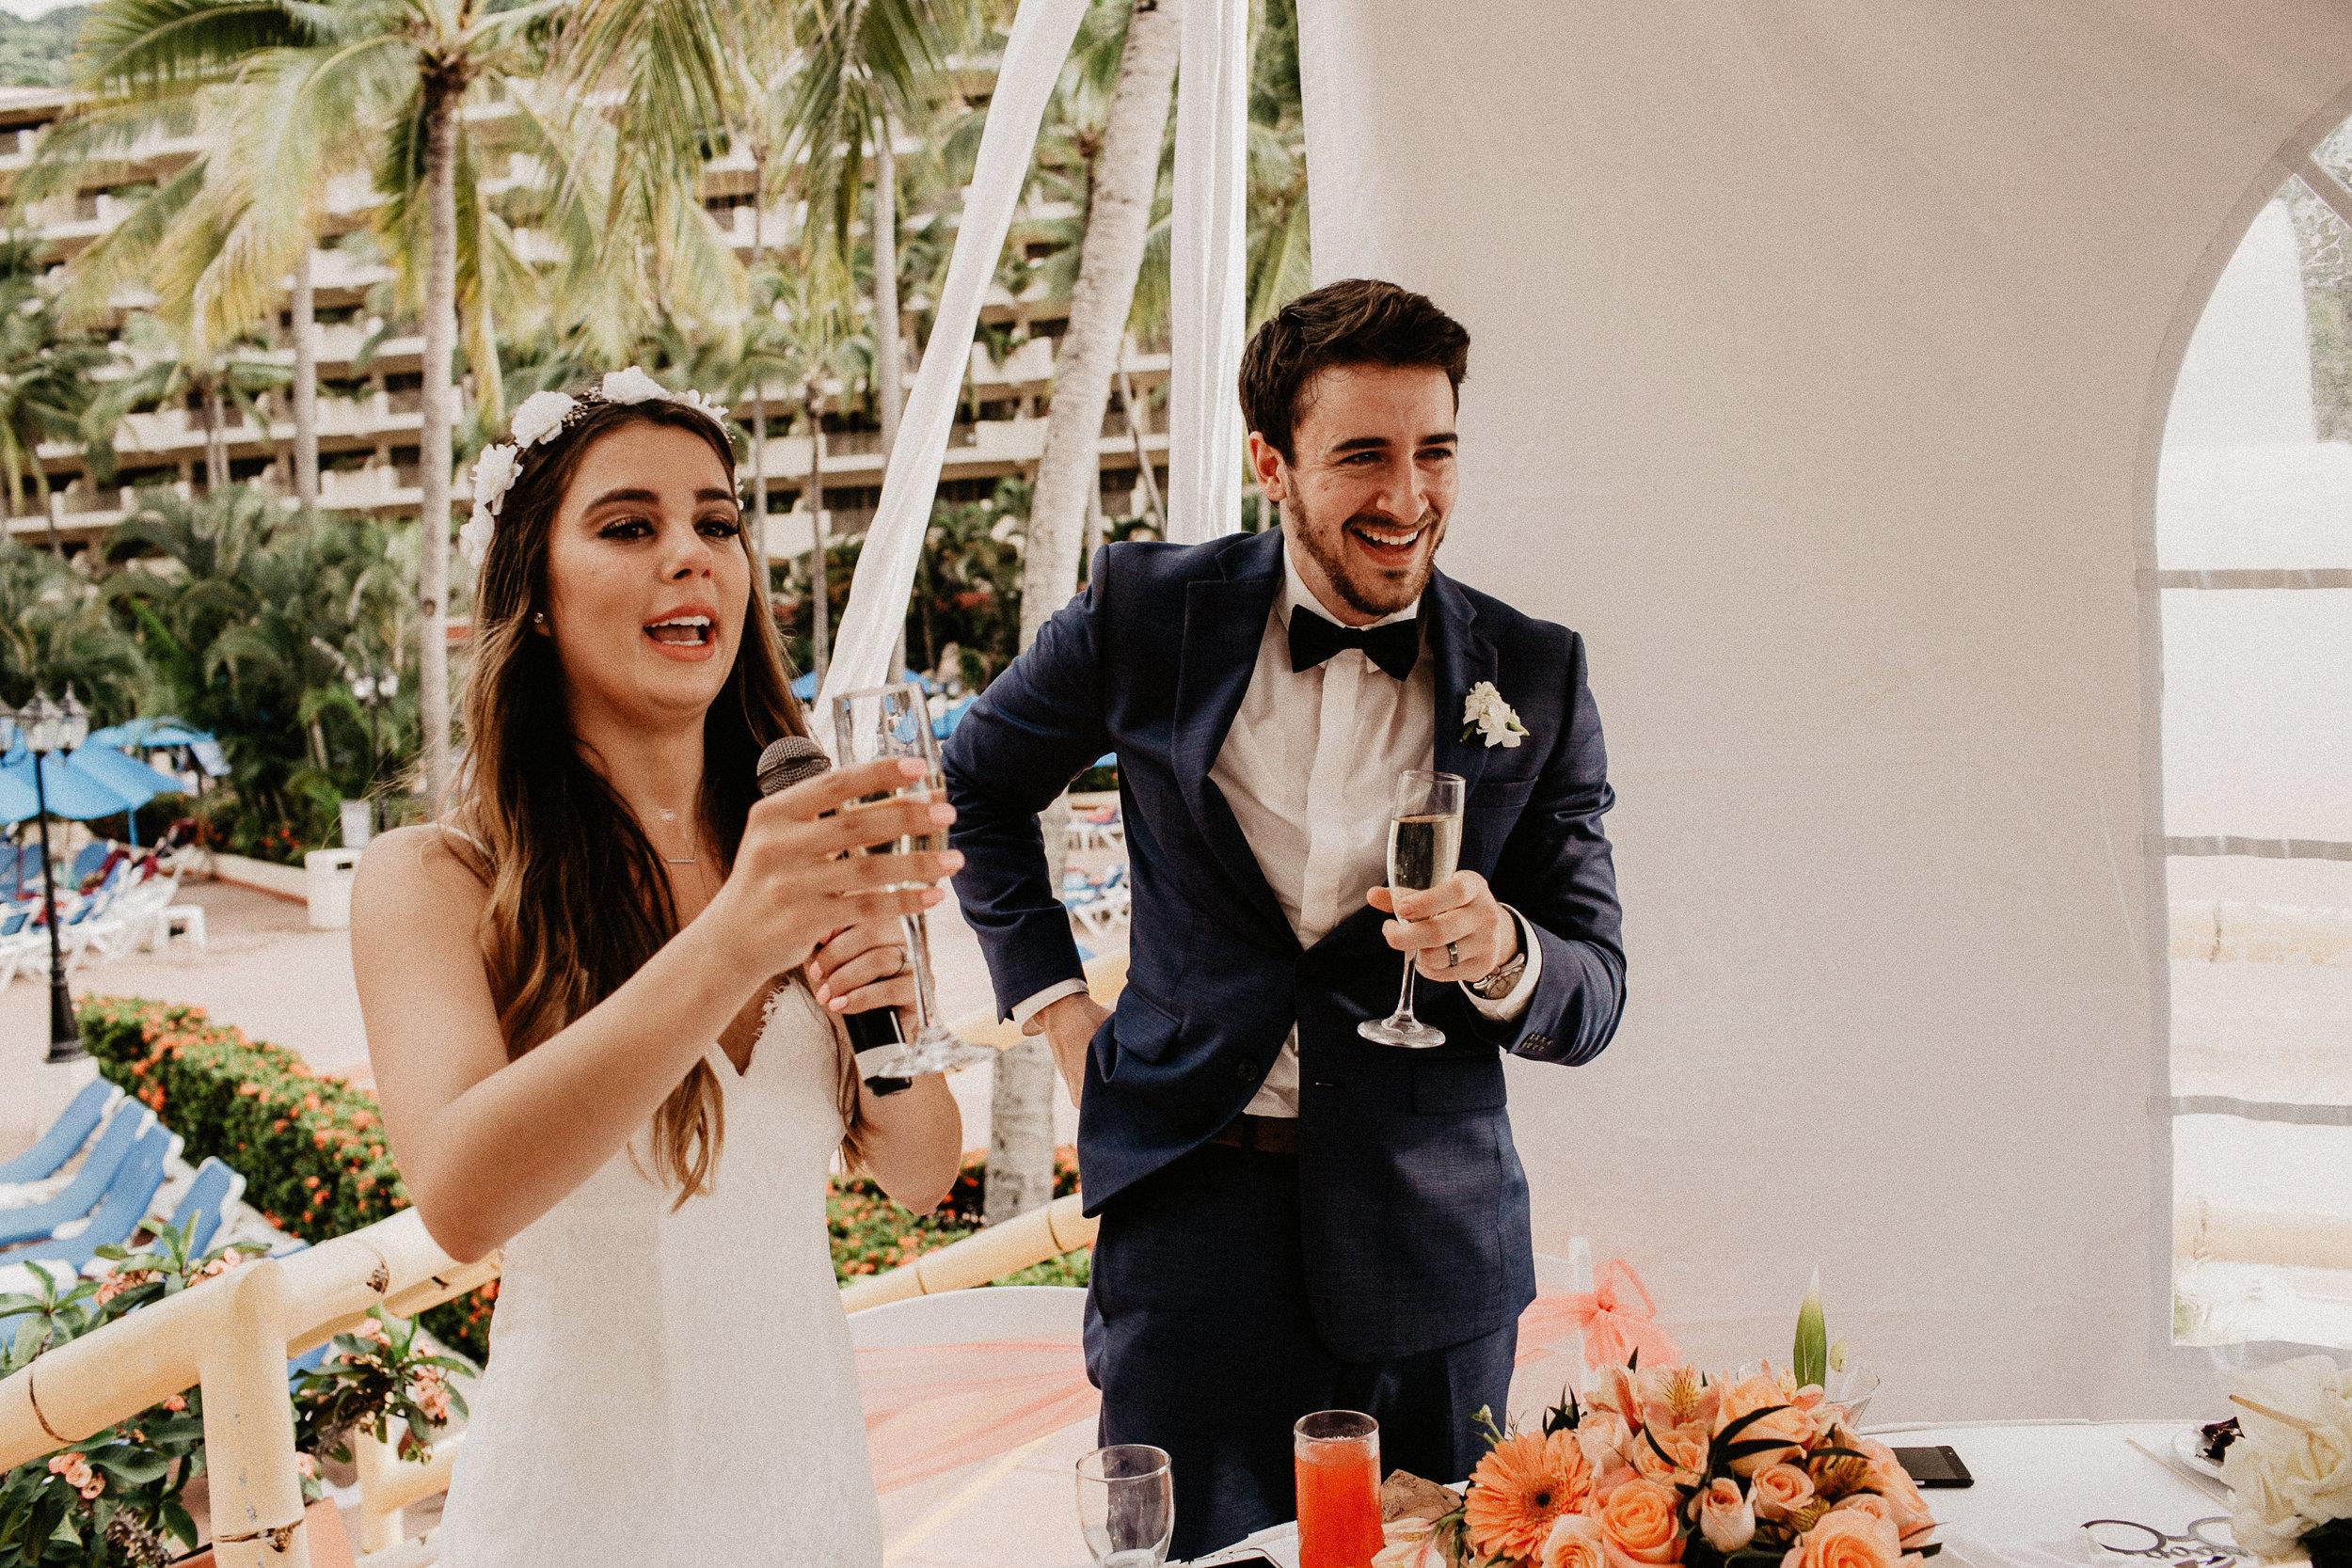 alfonso_flores_destination_wedding_photography_puerto_vallarta_hotel_barcelo_vallarta_cuttler_amela-632.JPG